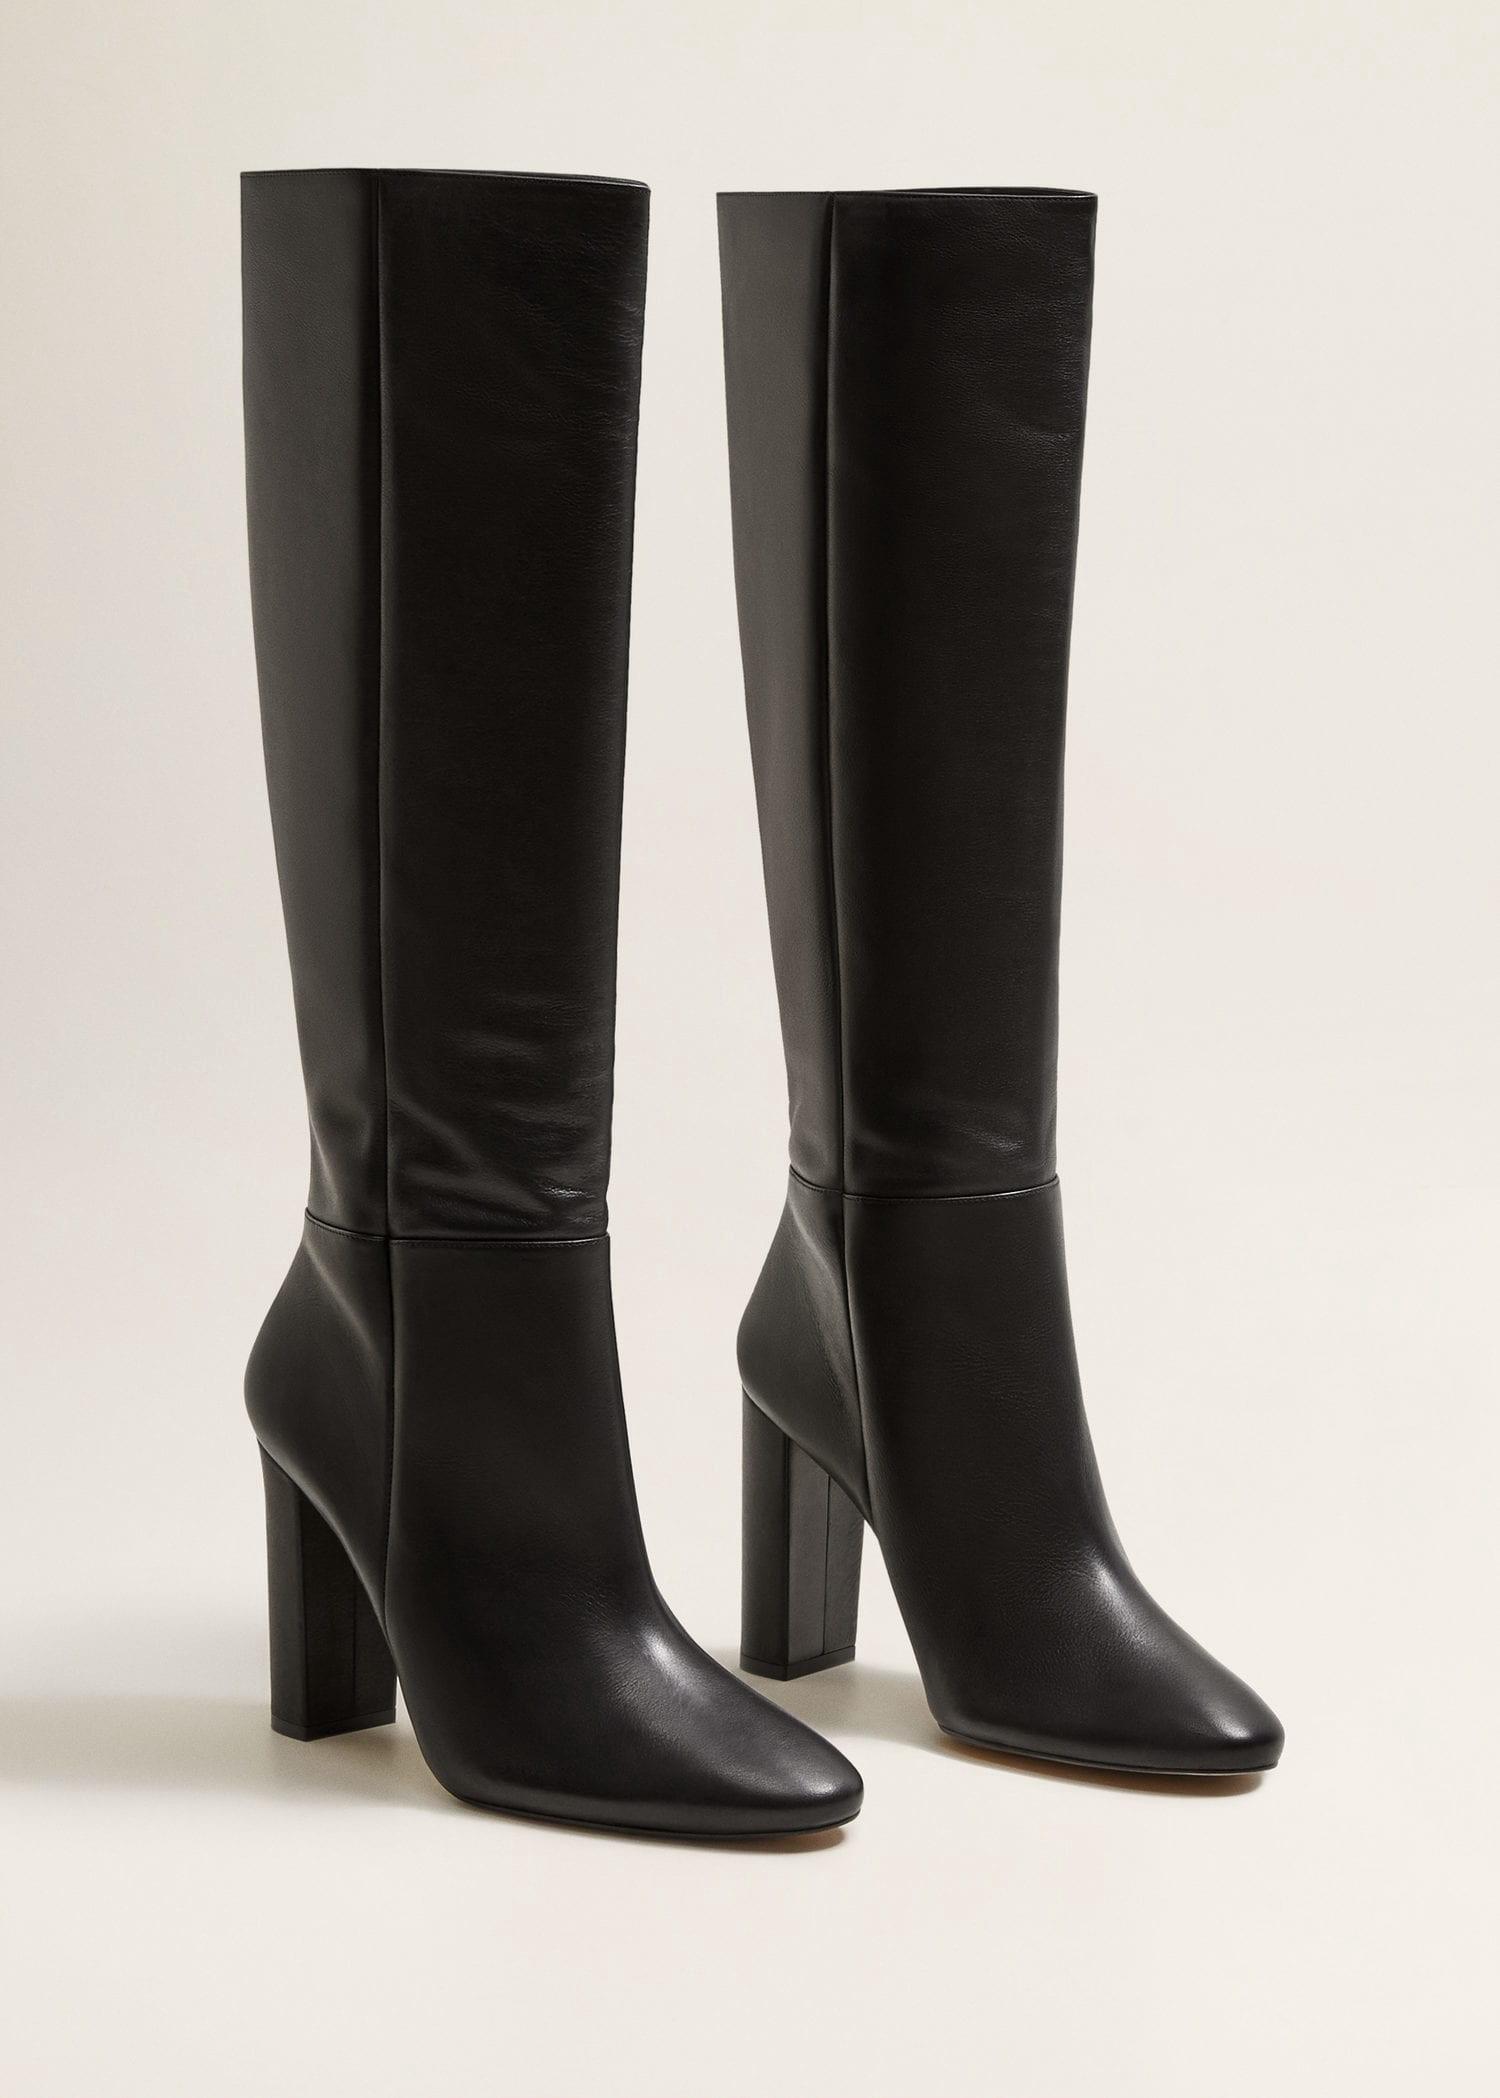 74132c1953c Mango Leather High-Leg Boots - White 6